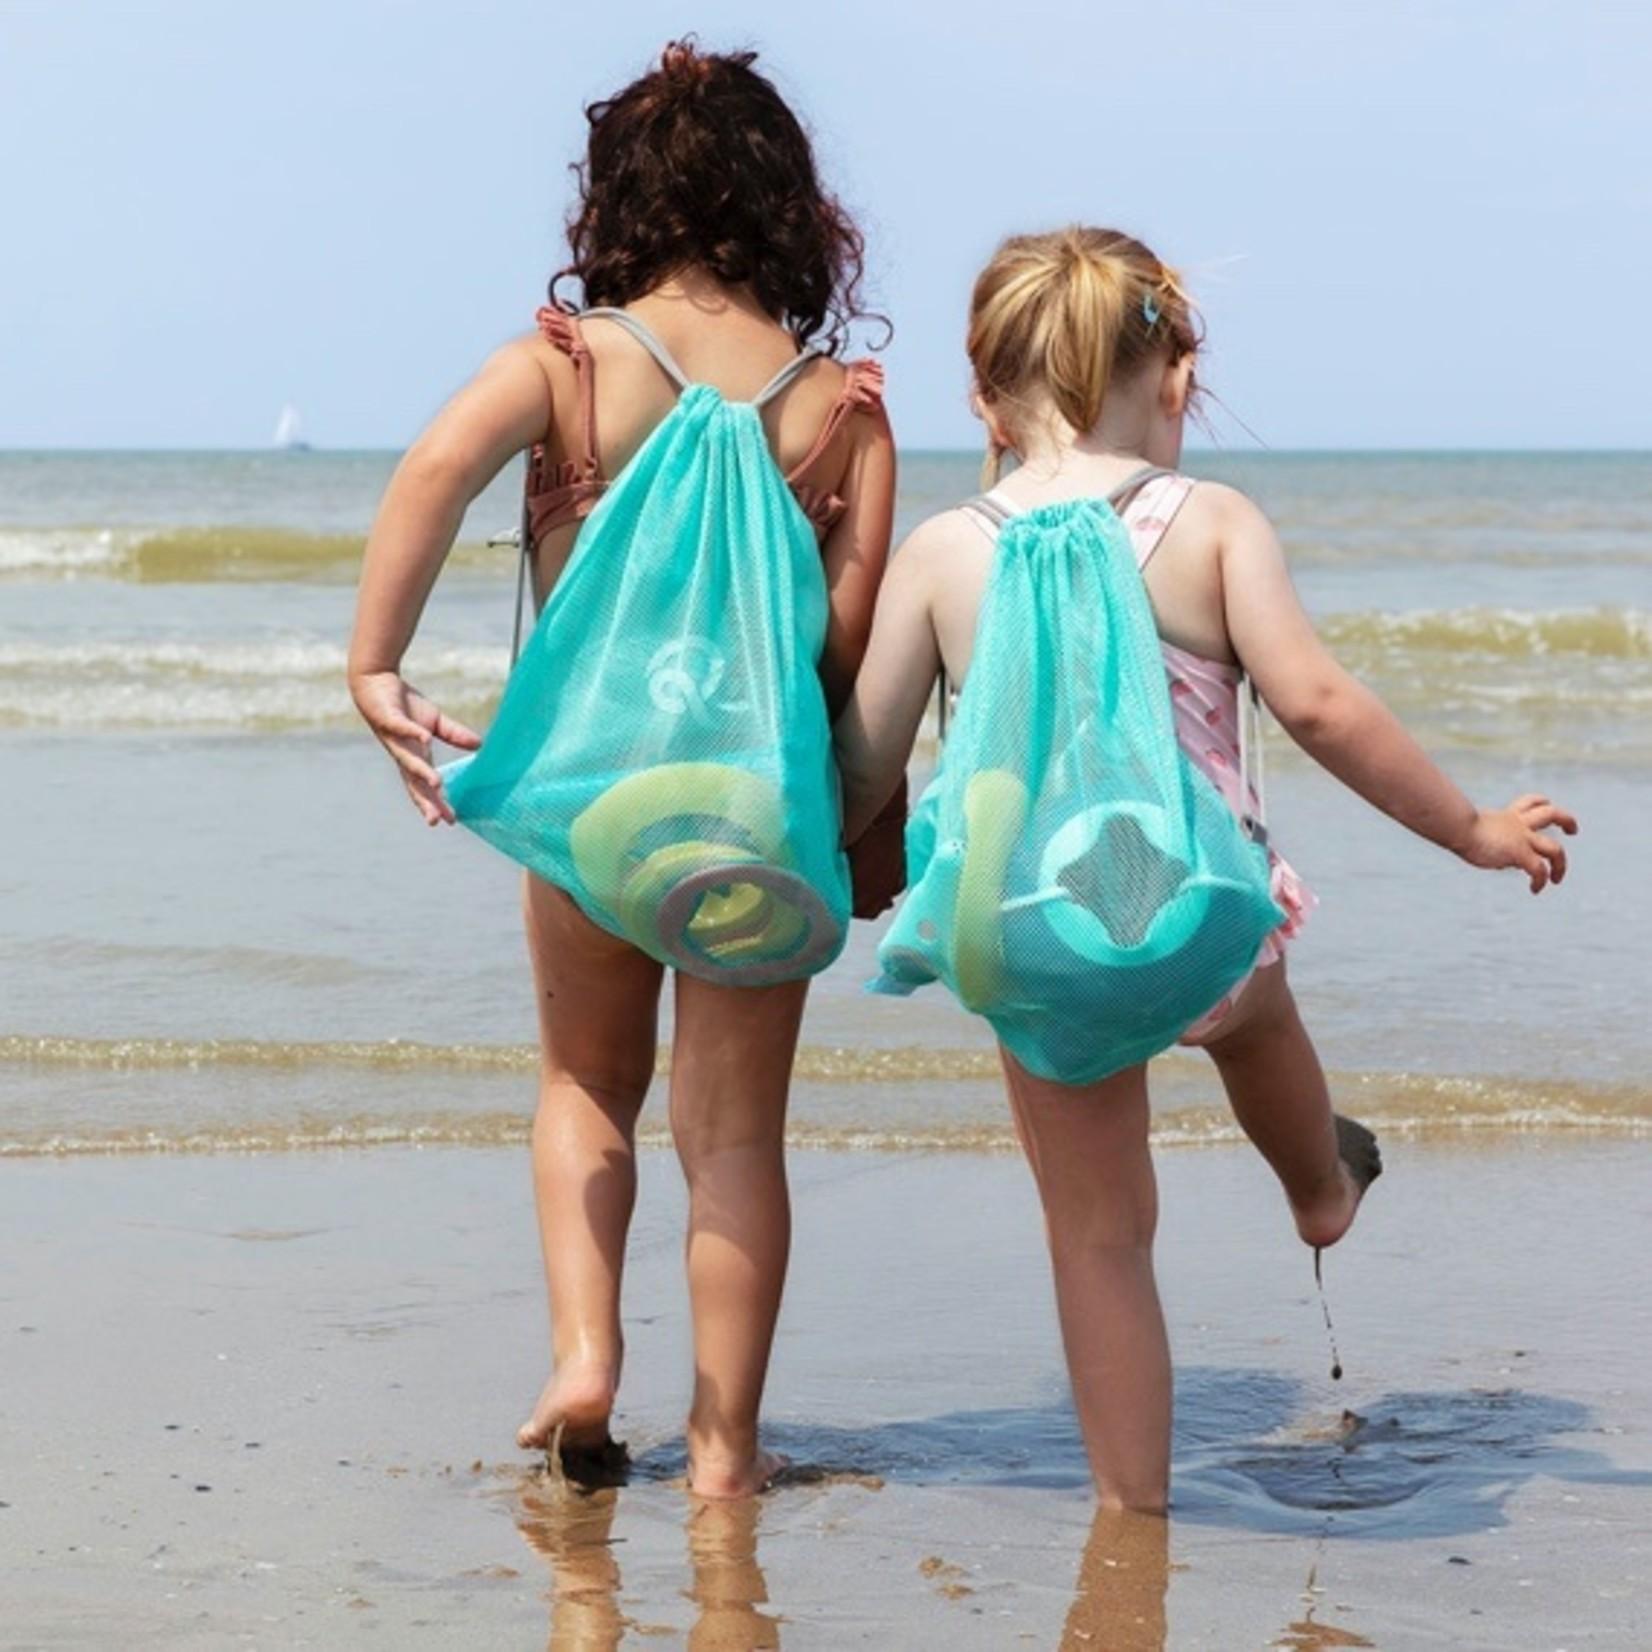 Beach Set : 1 Triplet + 1 Ringo combi (6rings + 1 ball) + 1 mesh bag